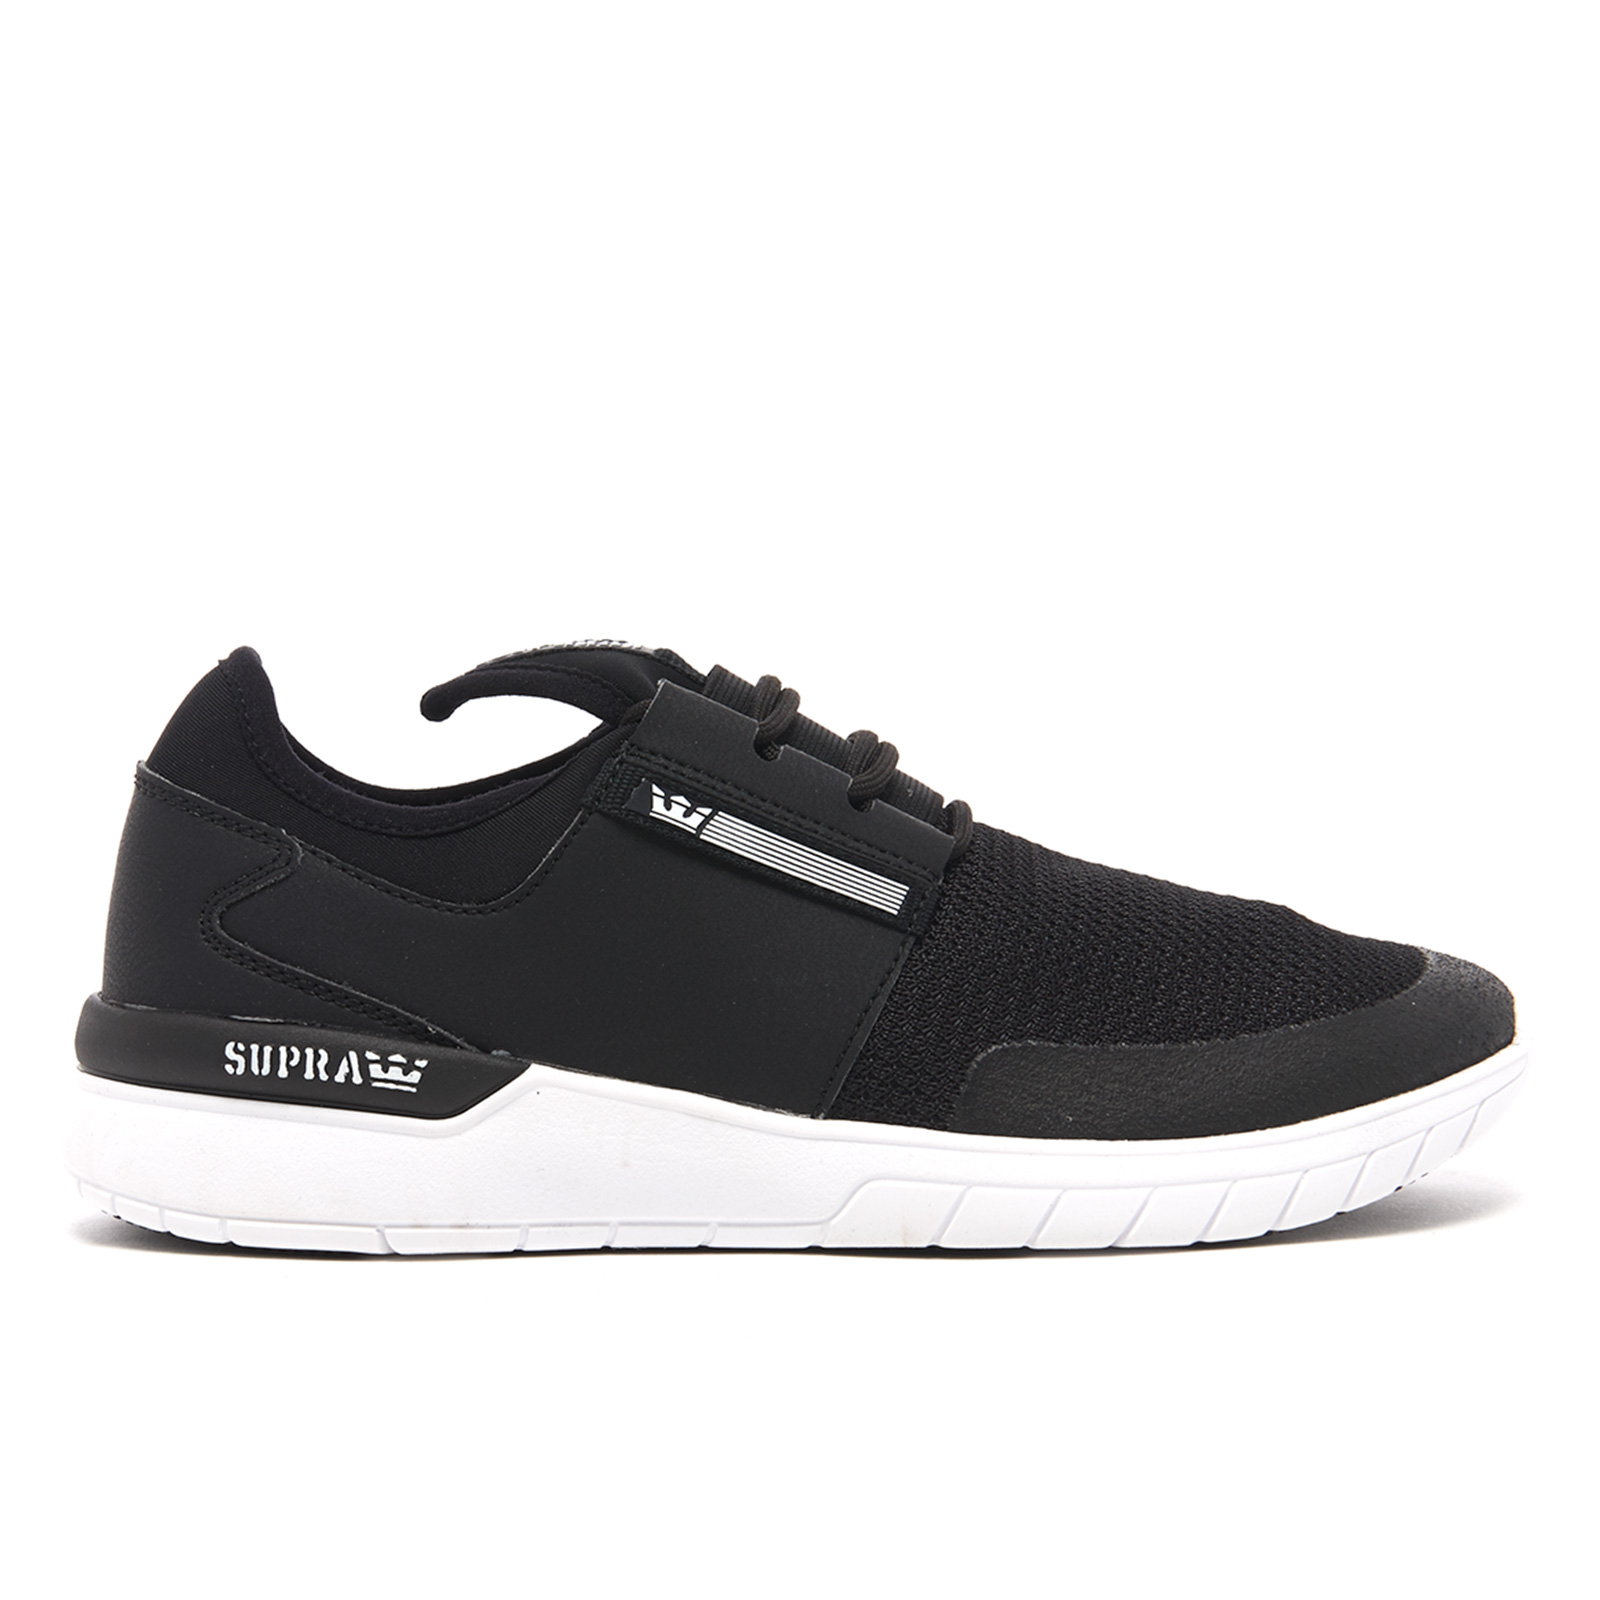 dfff3ecf9e63 Supra Men s Flow Run Trainers - Black White Mens Footwear